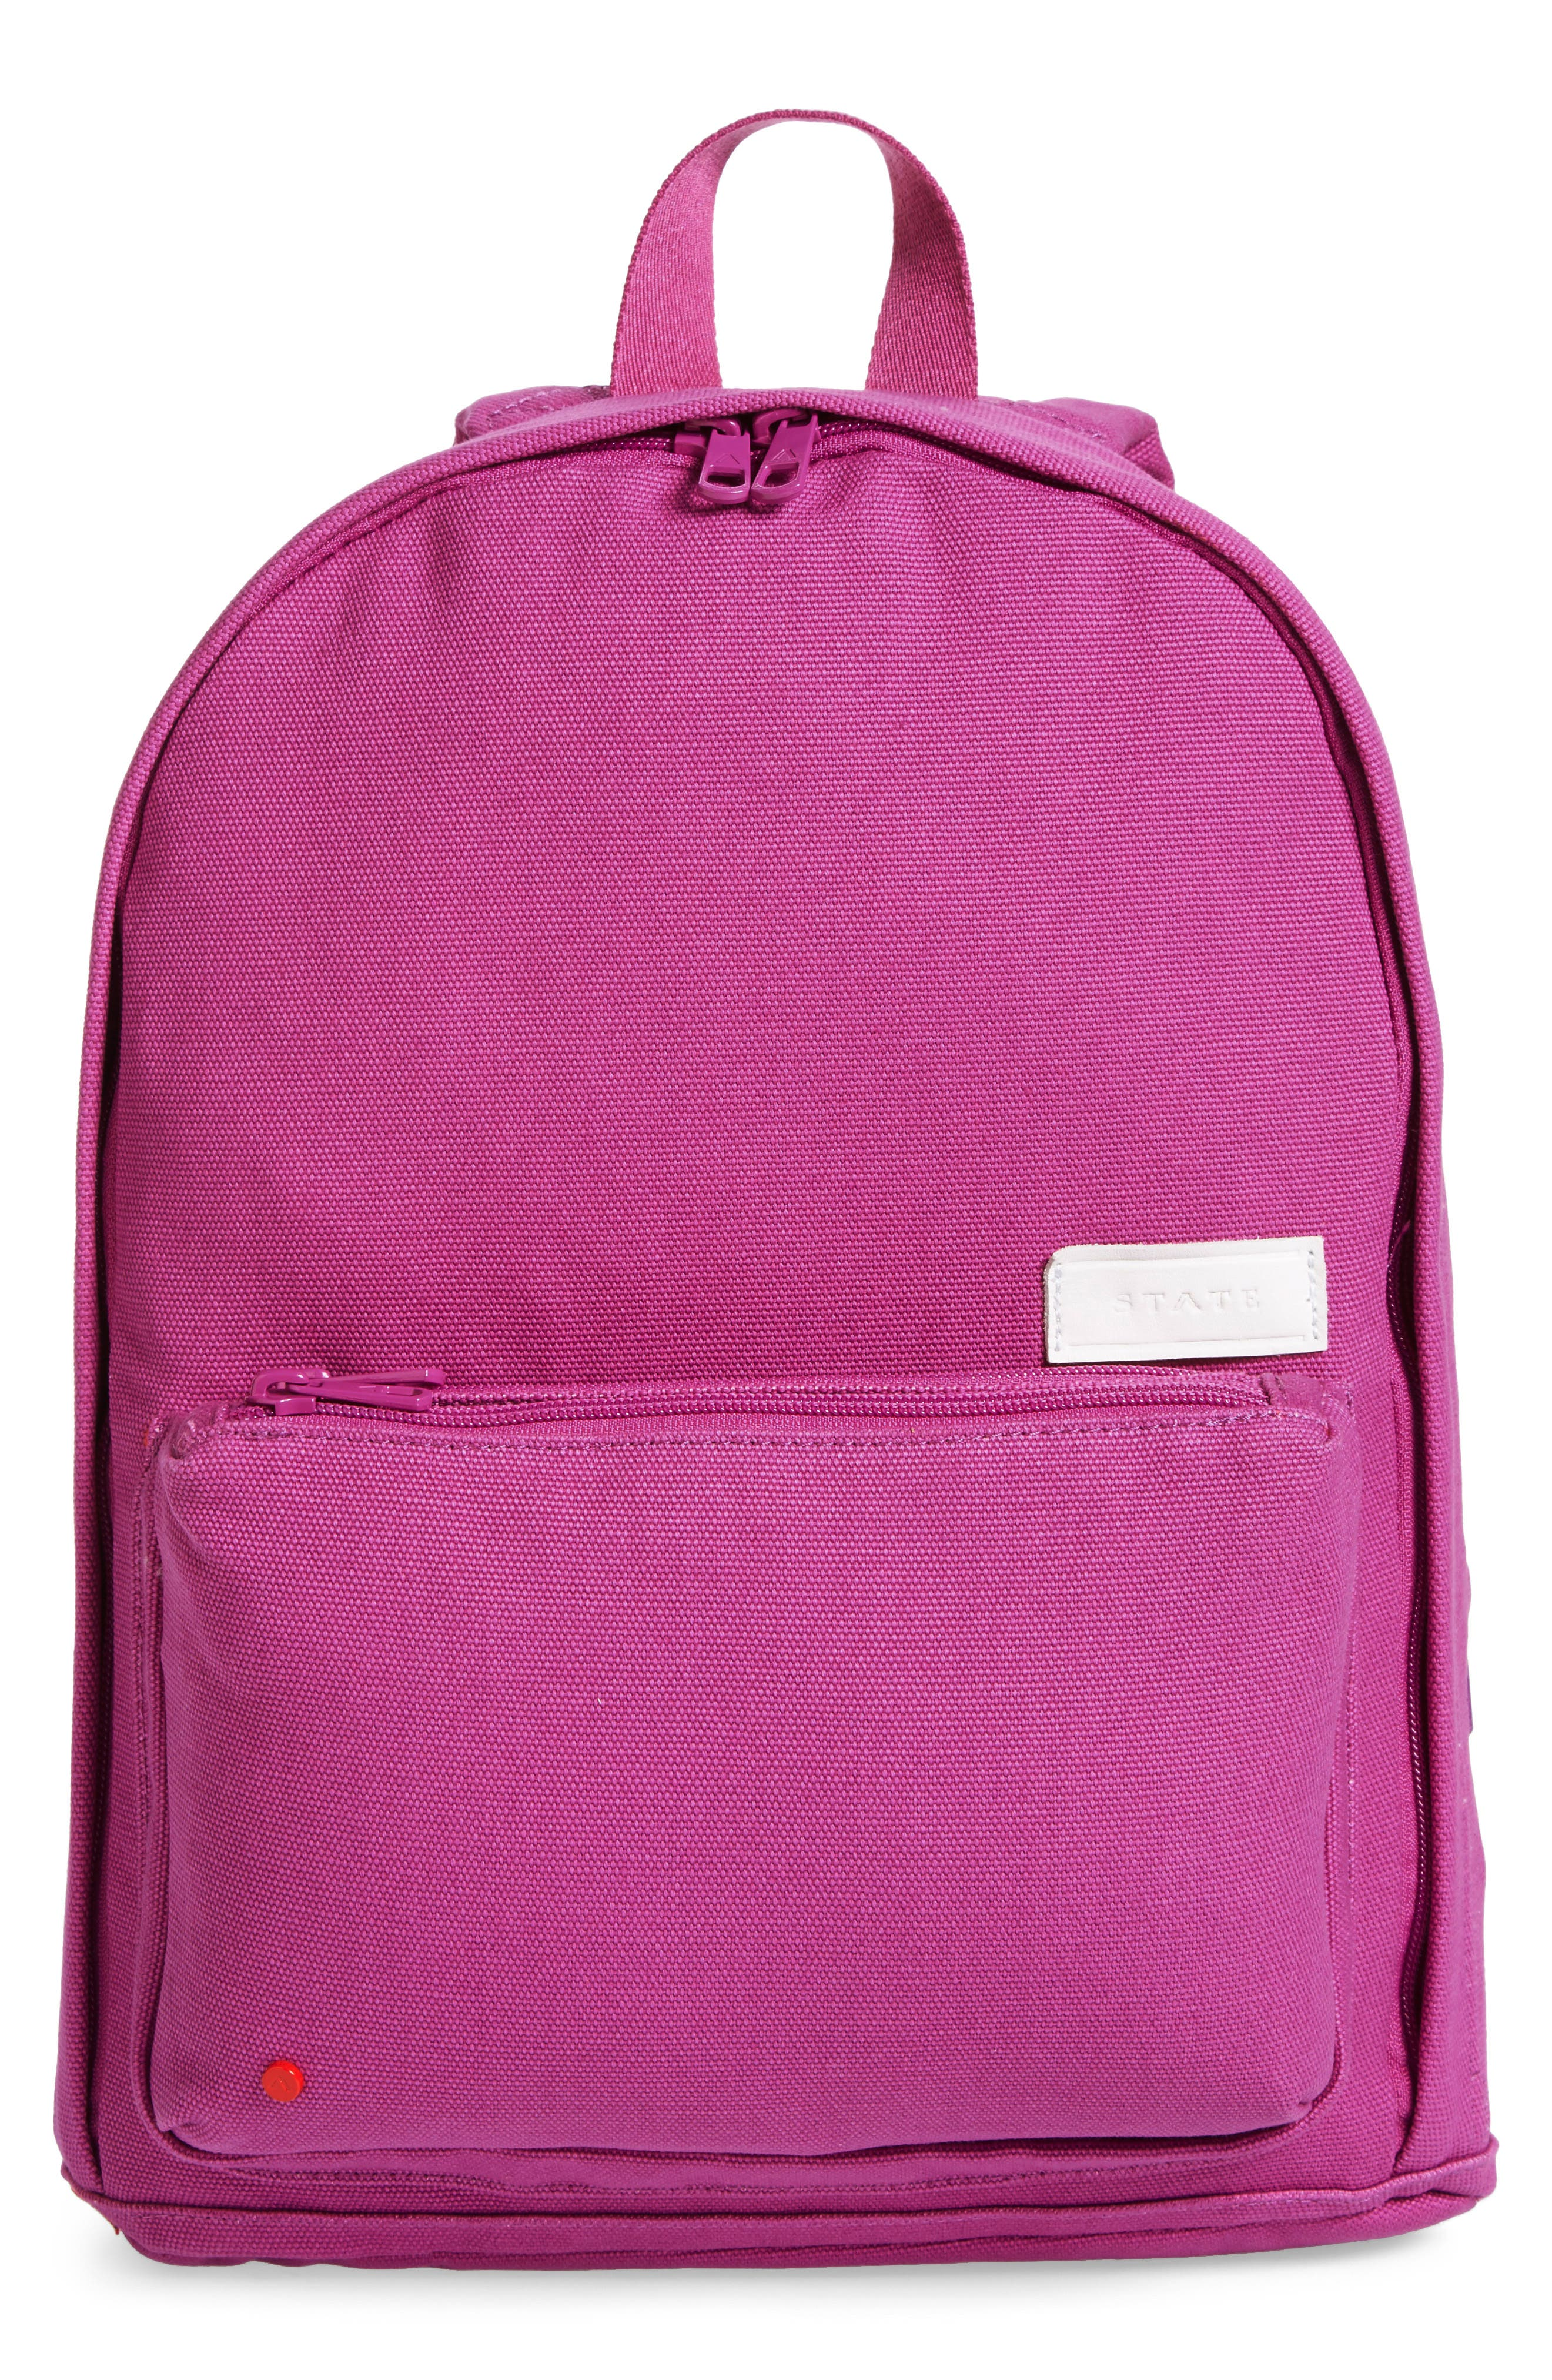 STATE Bags Slim Lorimer Water Resistant Canvas Backpack